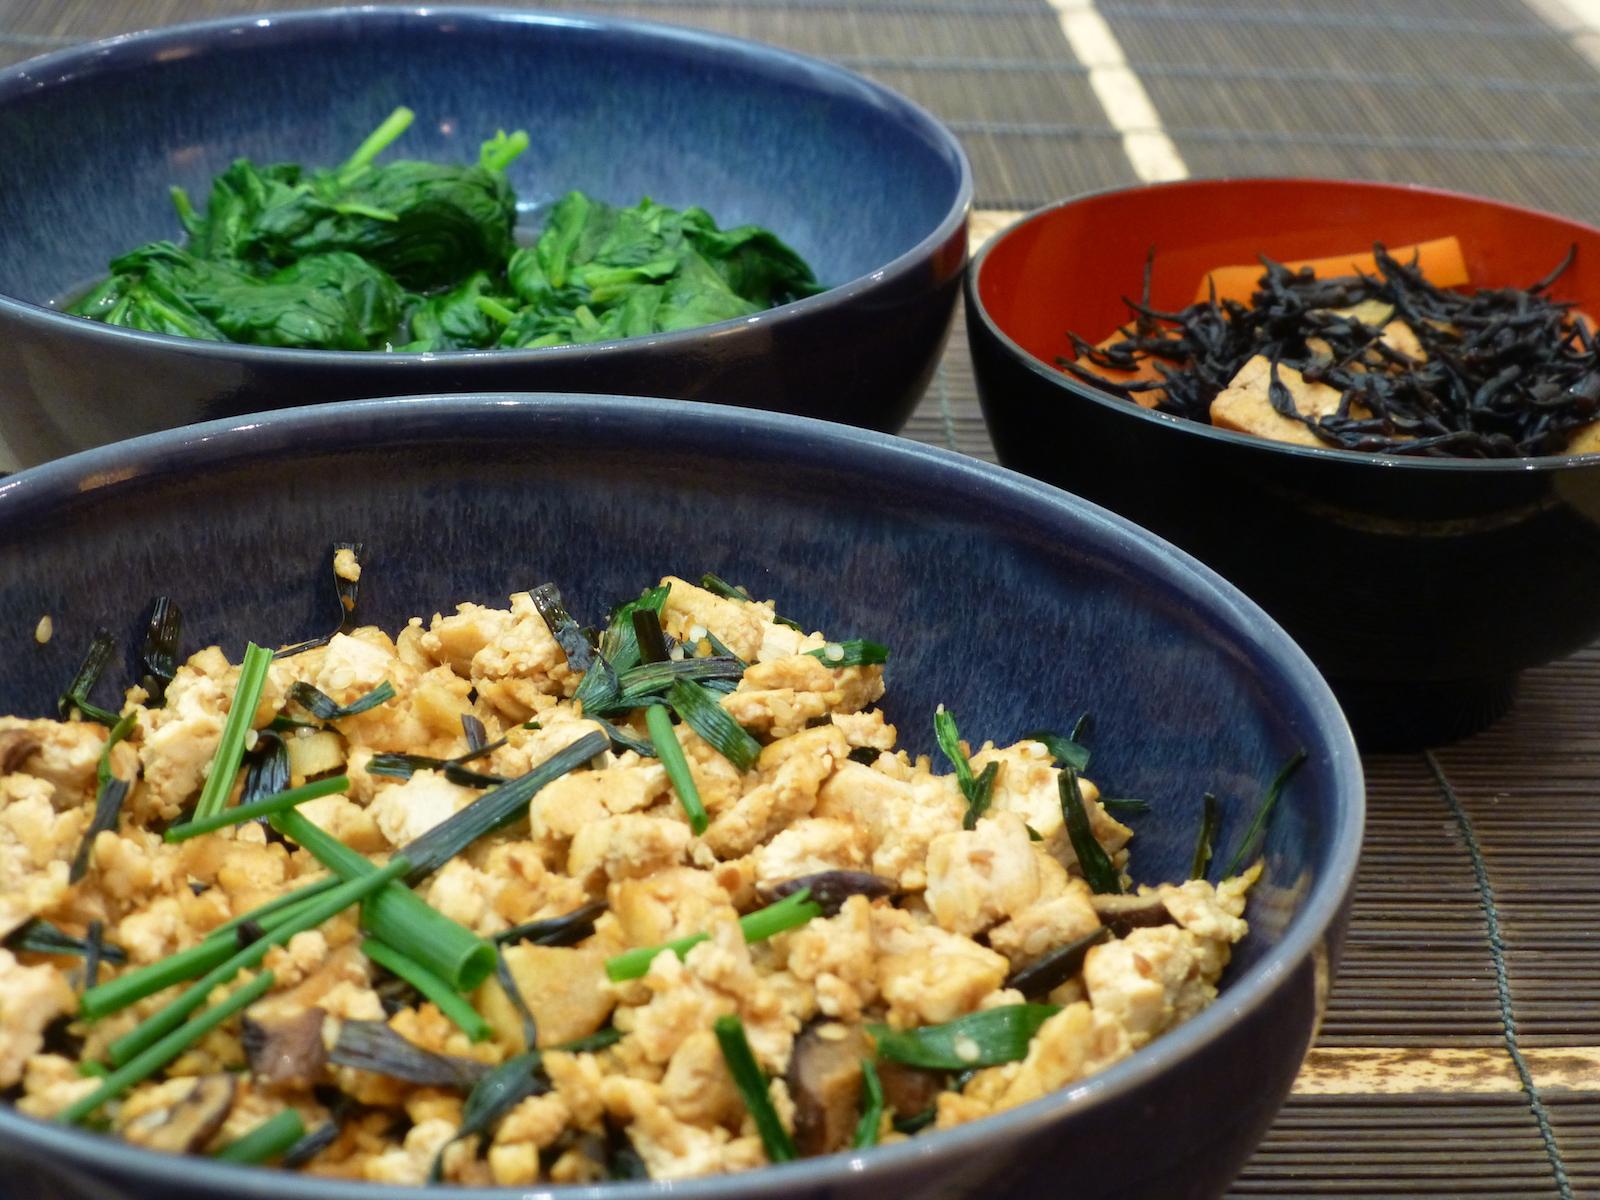 Scrambled tofu, hijiki, spinach and rice